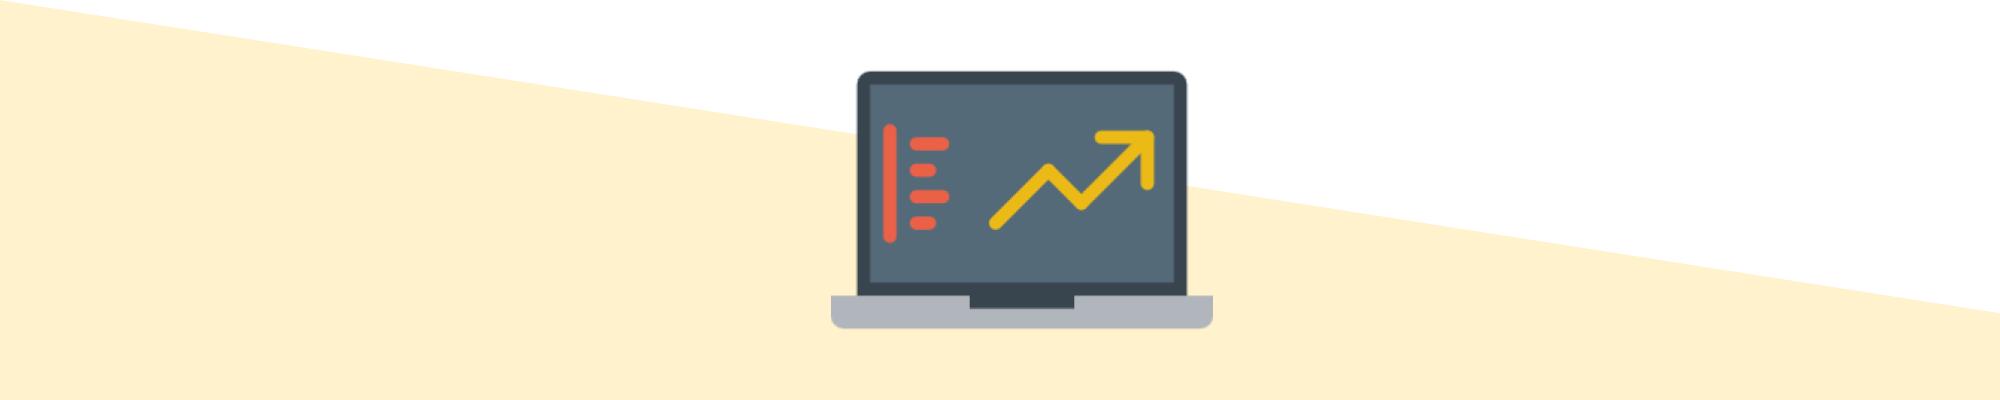 Gratis eller 360 premium med Google Analytics?